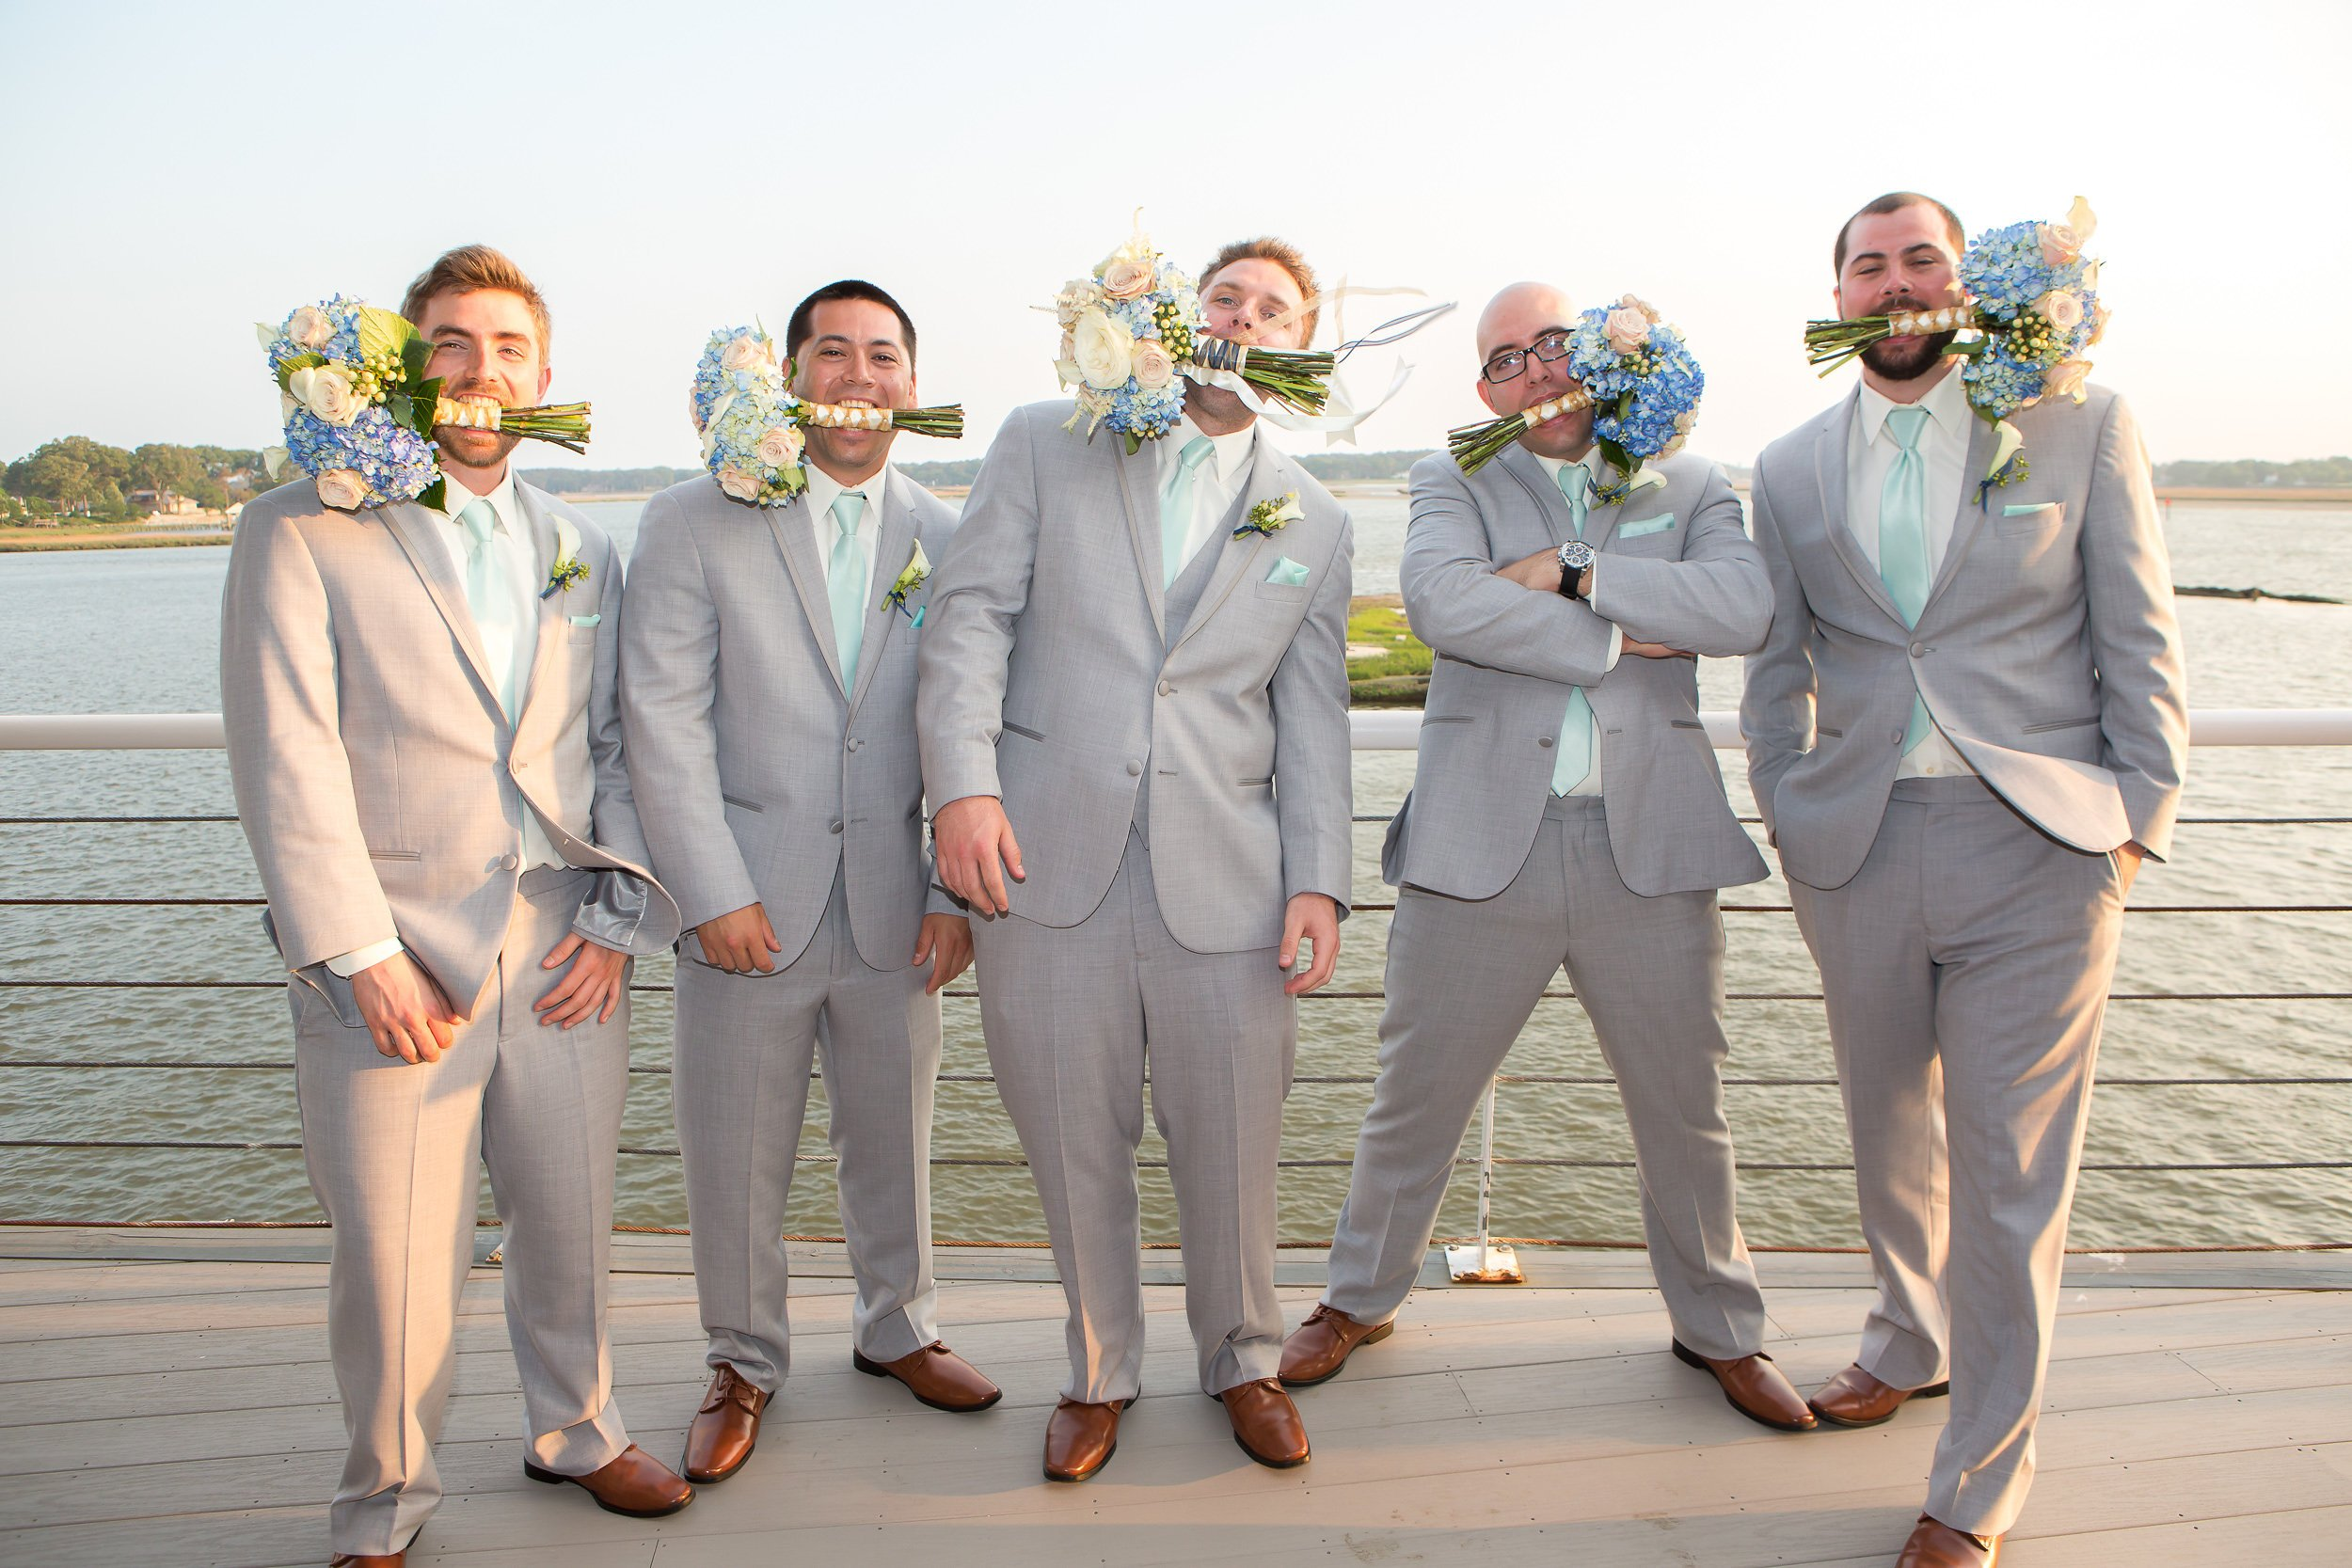 Best-Groomsman-Photo-Waterfront-Wedding-Venue-Jason-Jarvis-Photography.jpg